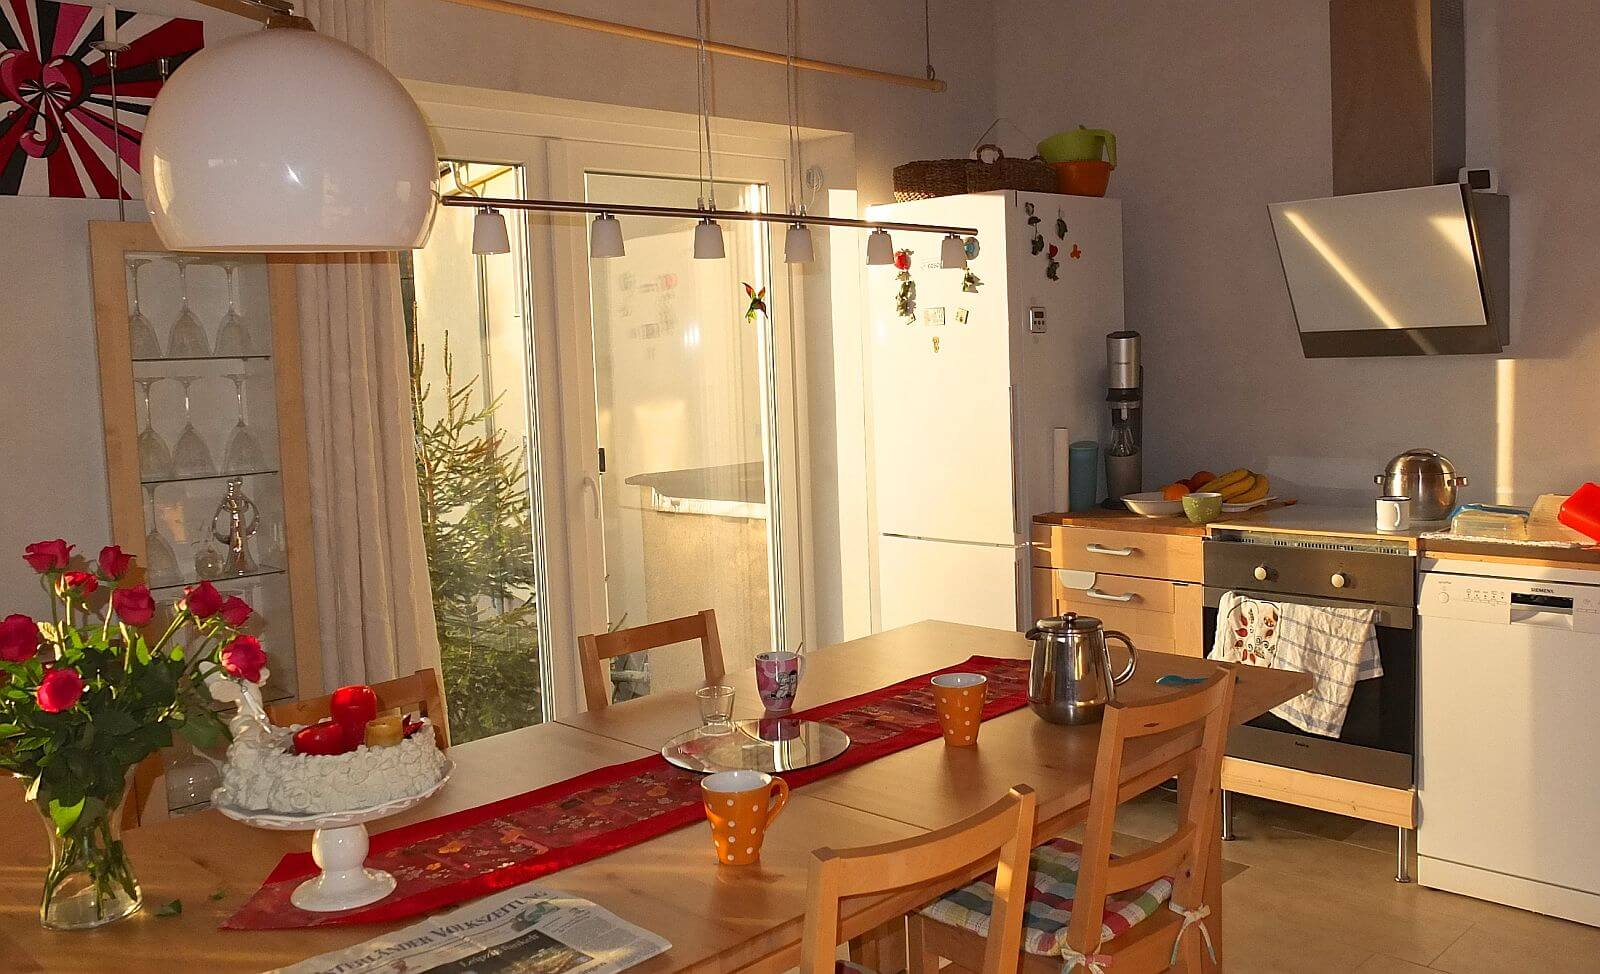 gro z gig fubodenheizung kinderzimmer erfahrung galerie die kinderzimmer design ideen. Black Bedroom Furniture Sets. Home Design Ideas